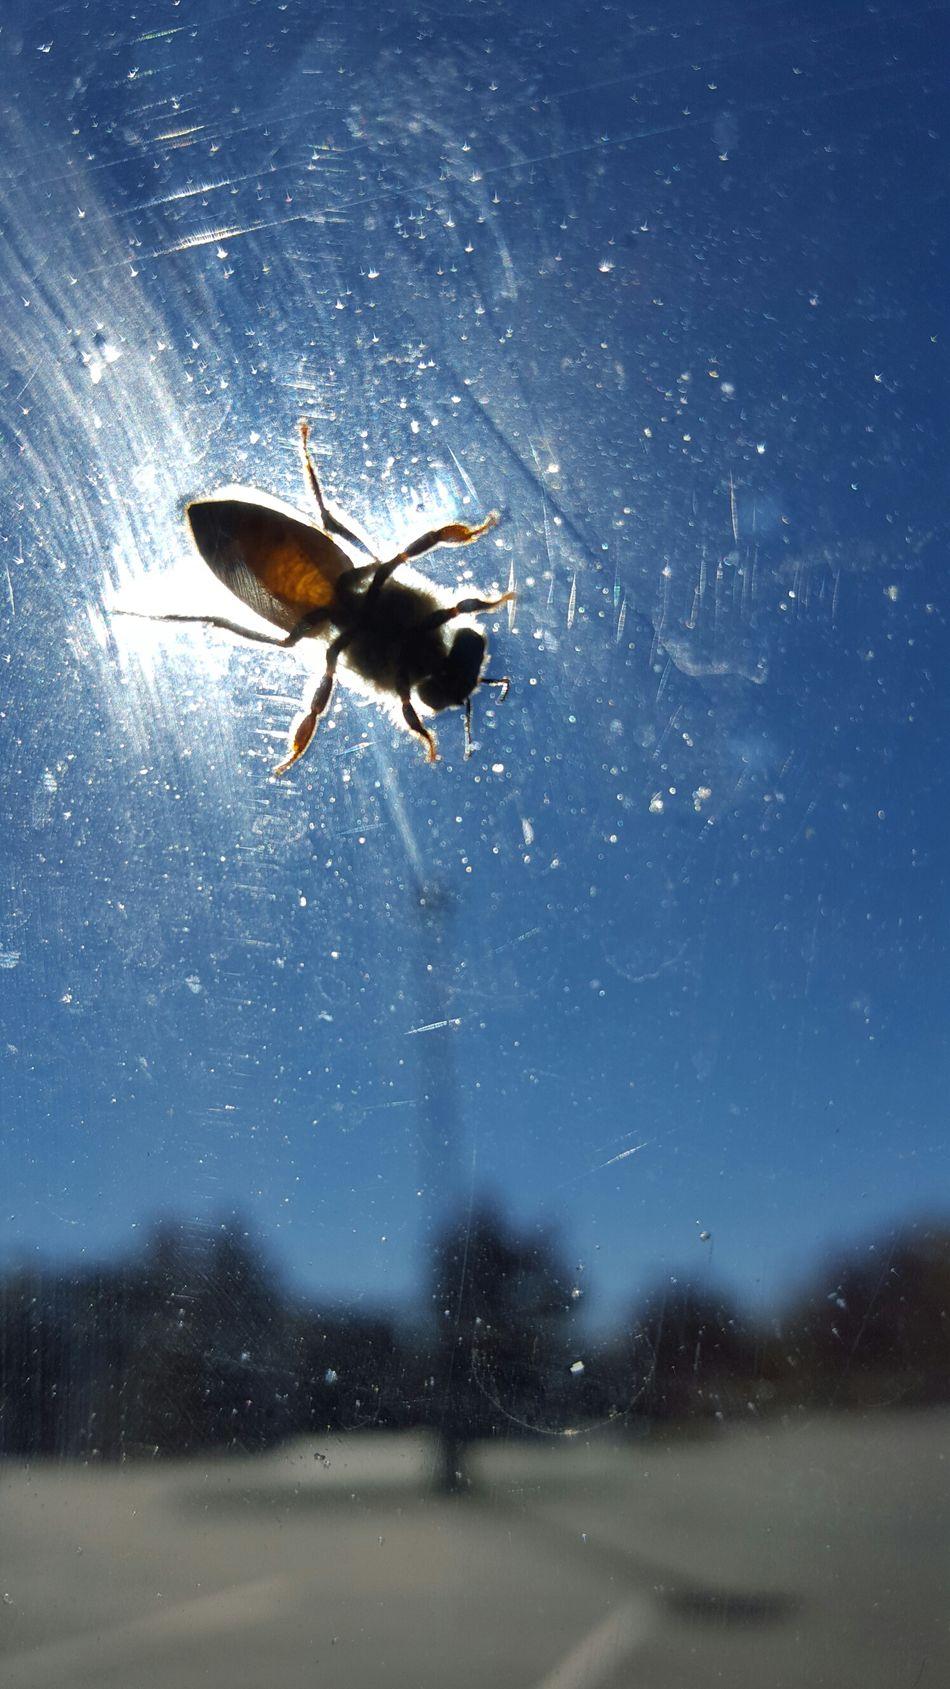 Bee on my windshield Bee Buddy Window Hanging Out Sun Sunny Anatomy Skeletal Insect Beeanatomy Landscape Tiltshift